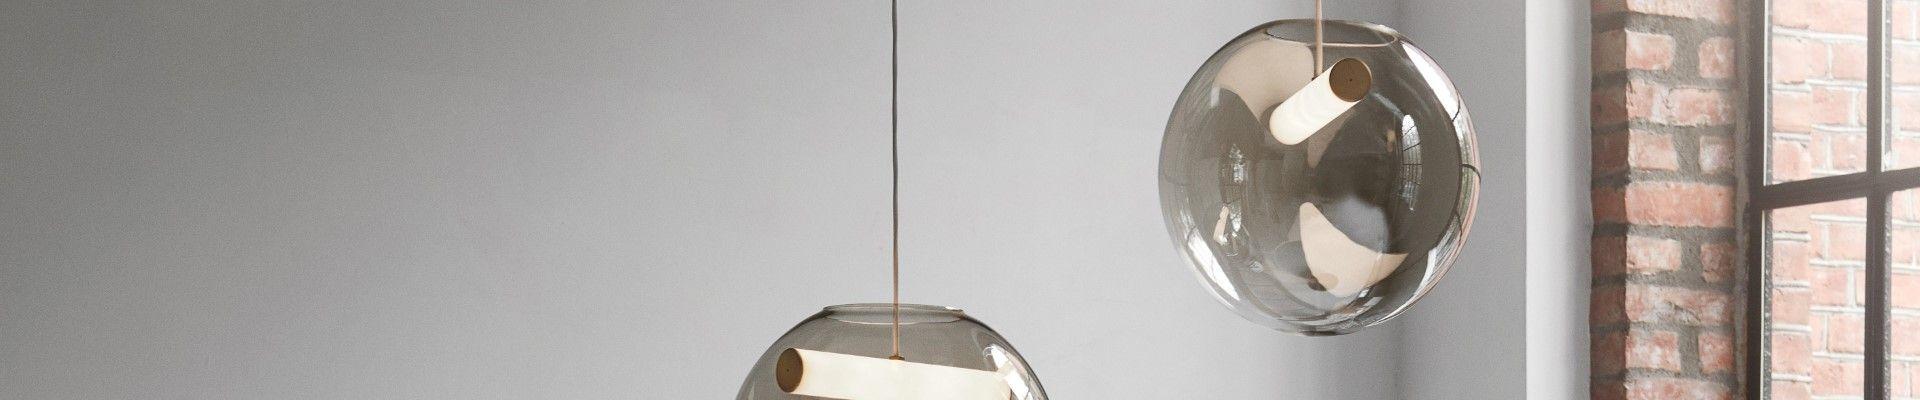 Northern hanglampen